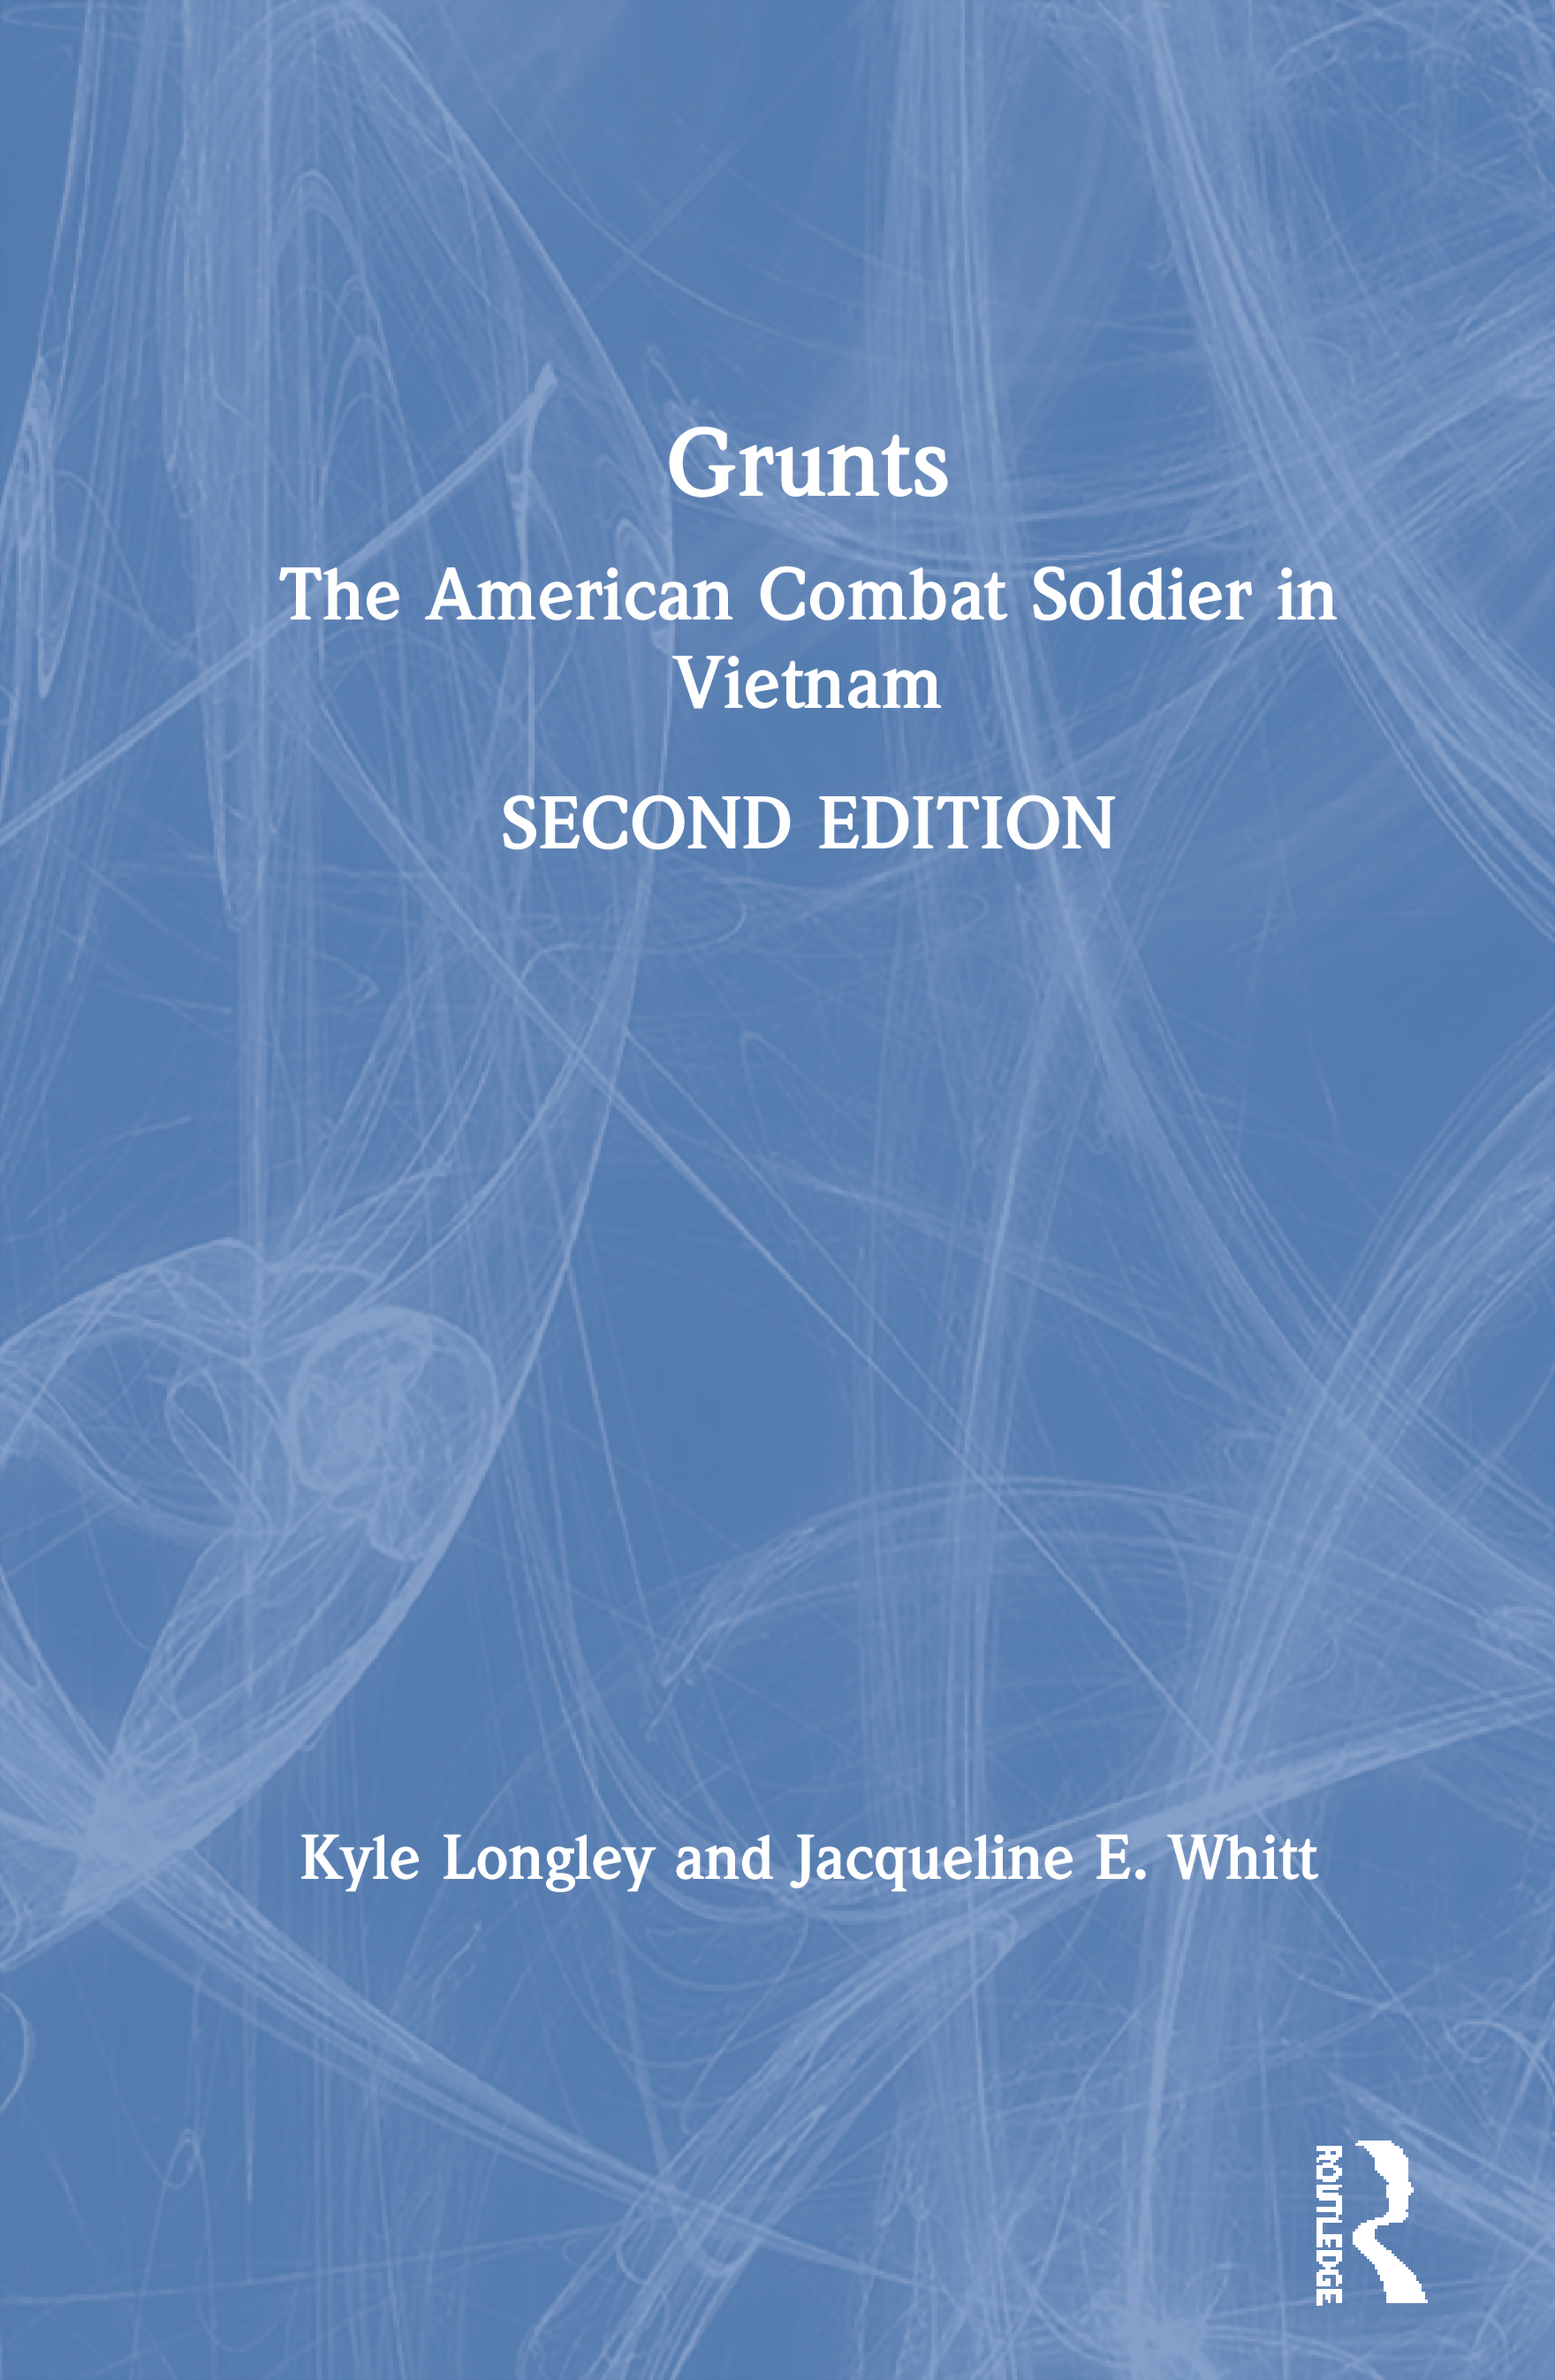 Grunts: The American Combat Soldier in Vietnam book cover